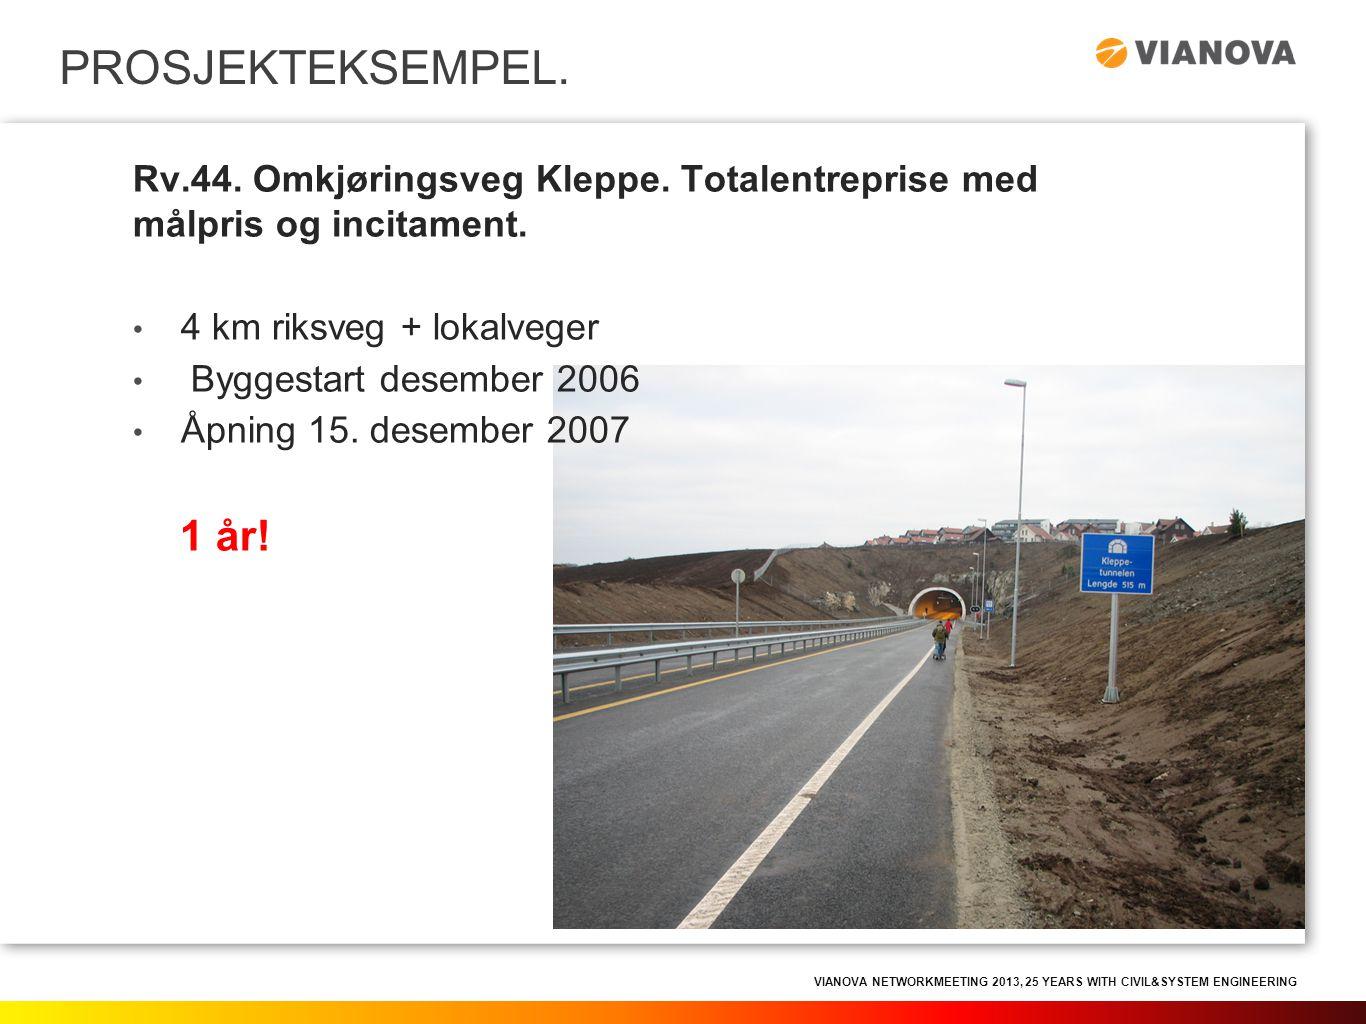 VIANOVA NETWORKMEETING 2013, 25 YEARS WITH CIVIL&SYSTEM ENGINEERING PROSJEKTEKSEMPEL. Rv.44. Omkjøringsveg Kleppe. Totalentreprise med målpris og inci